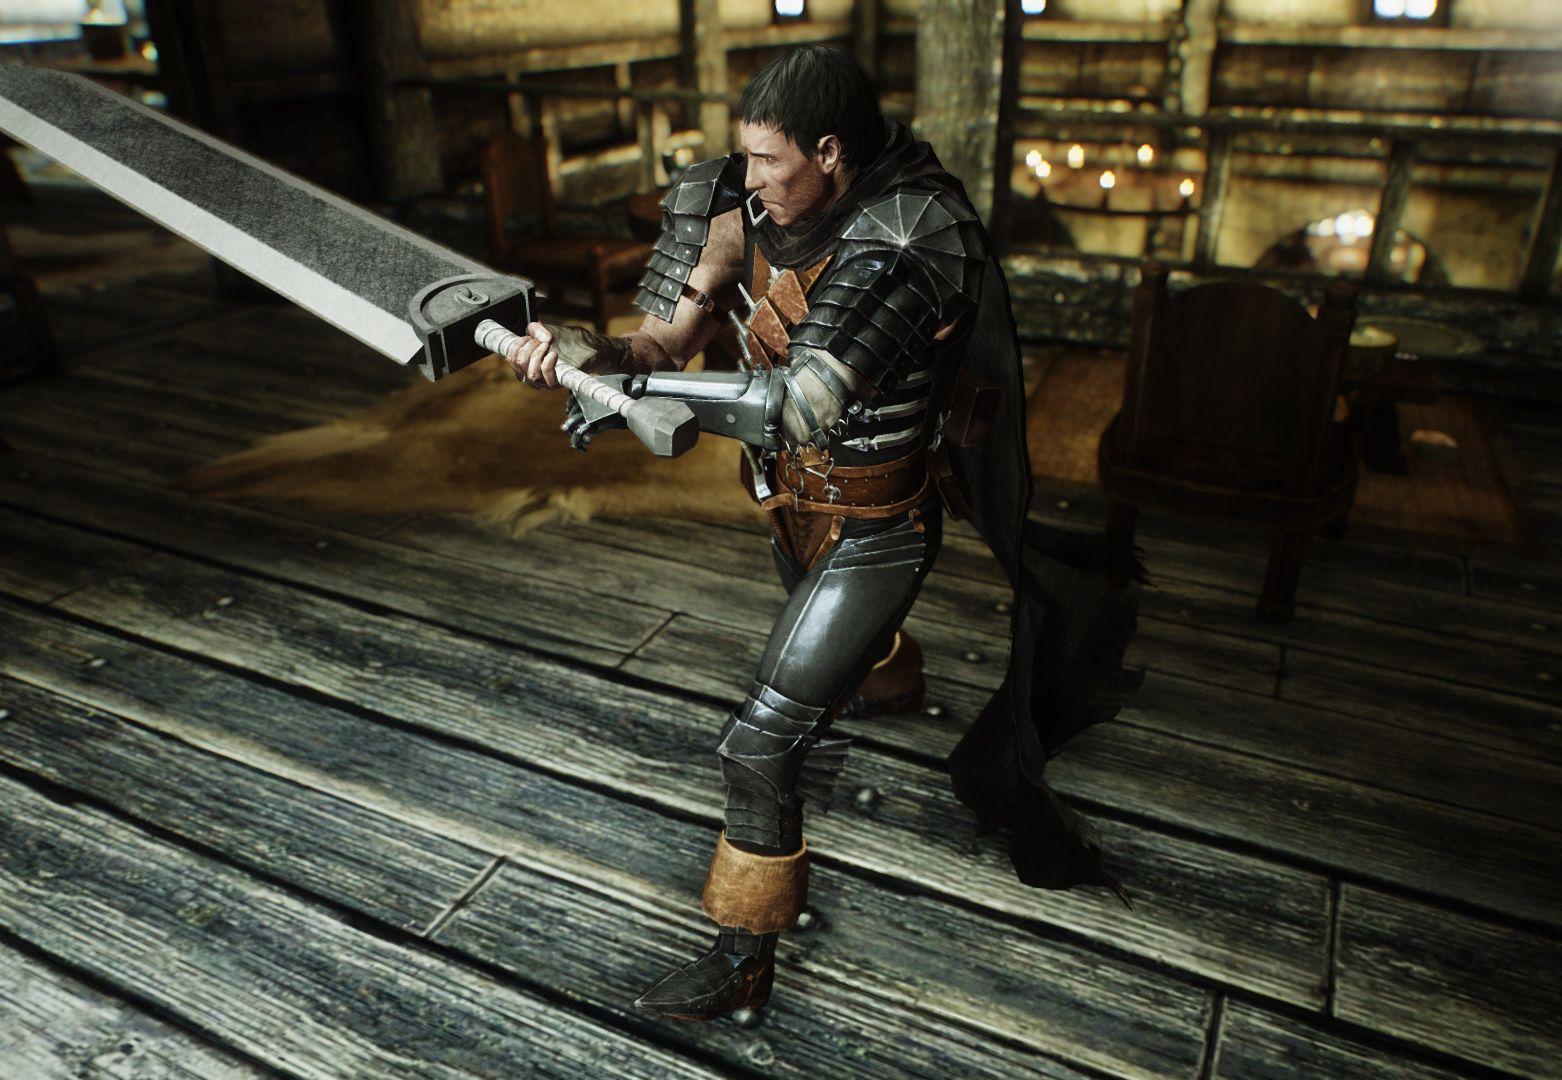 Berserk Black Swordsman Armor Mod & Dragonslayer Sword Mod for